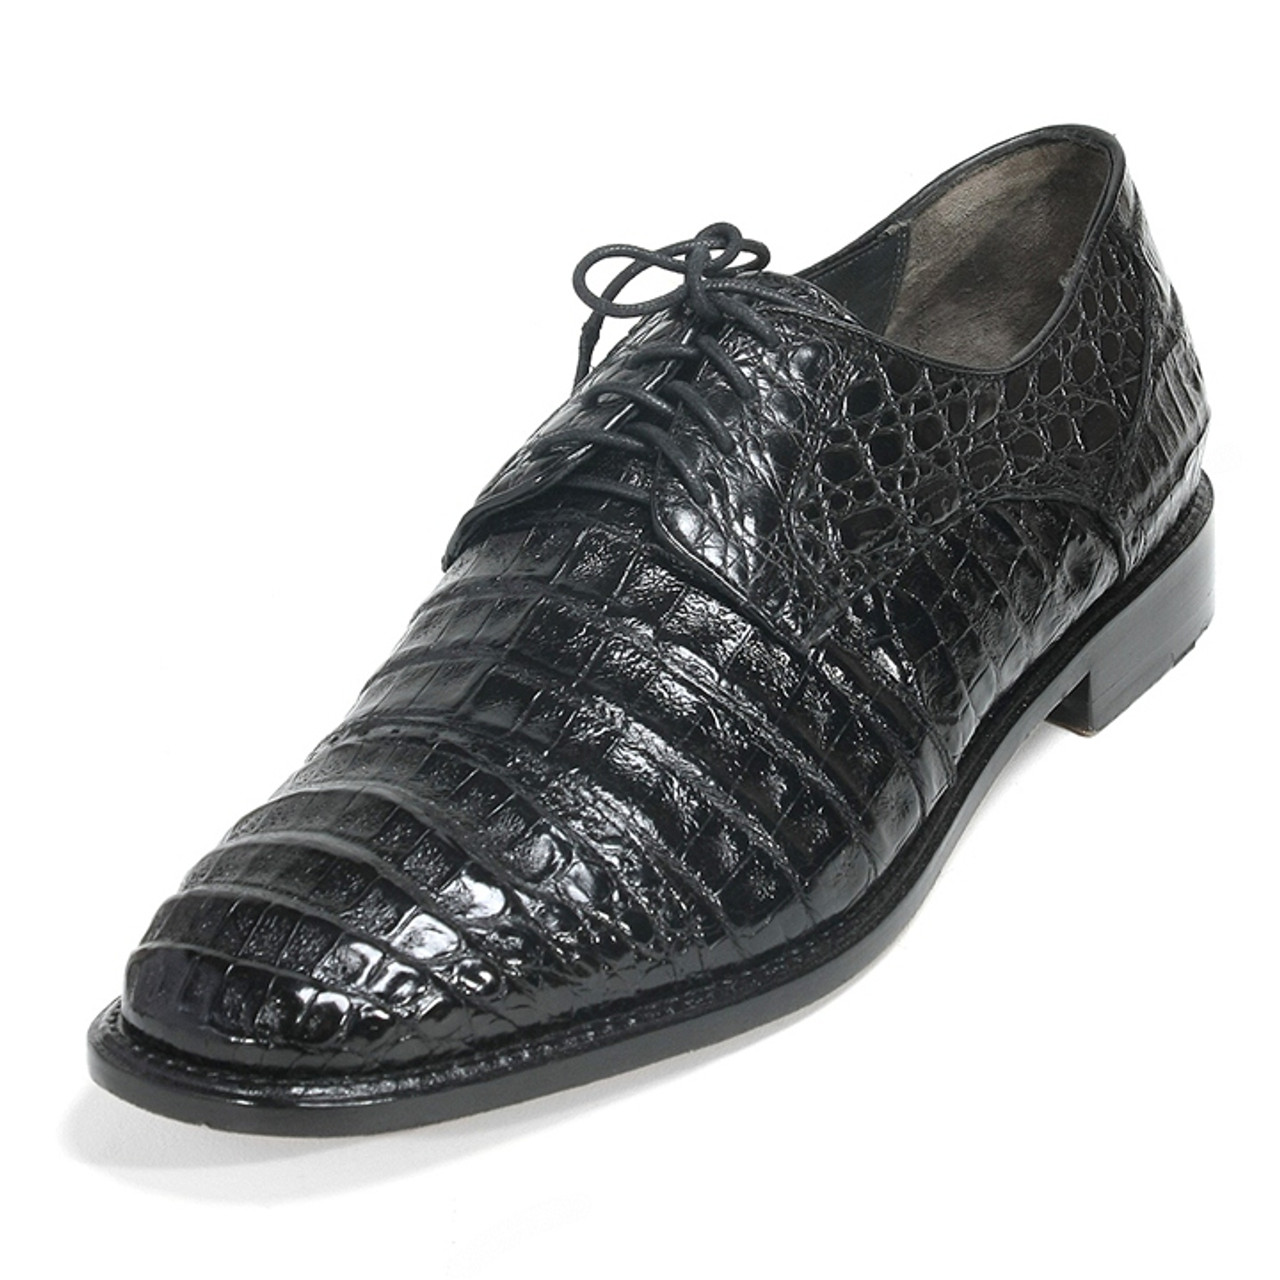 Los Altos BLACK WHITE Genuine Caiman Crocodile With Lizard Dress Shoes Oxford D